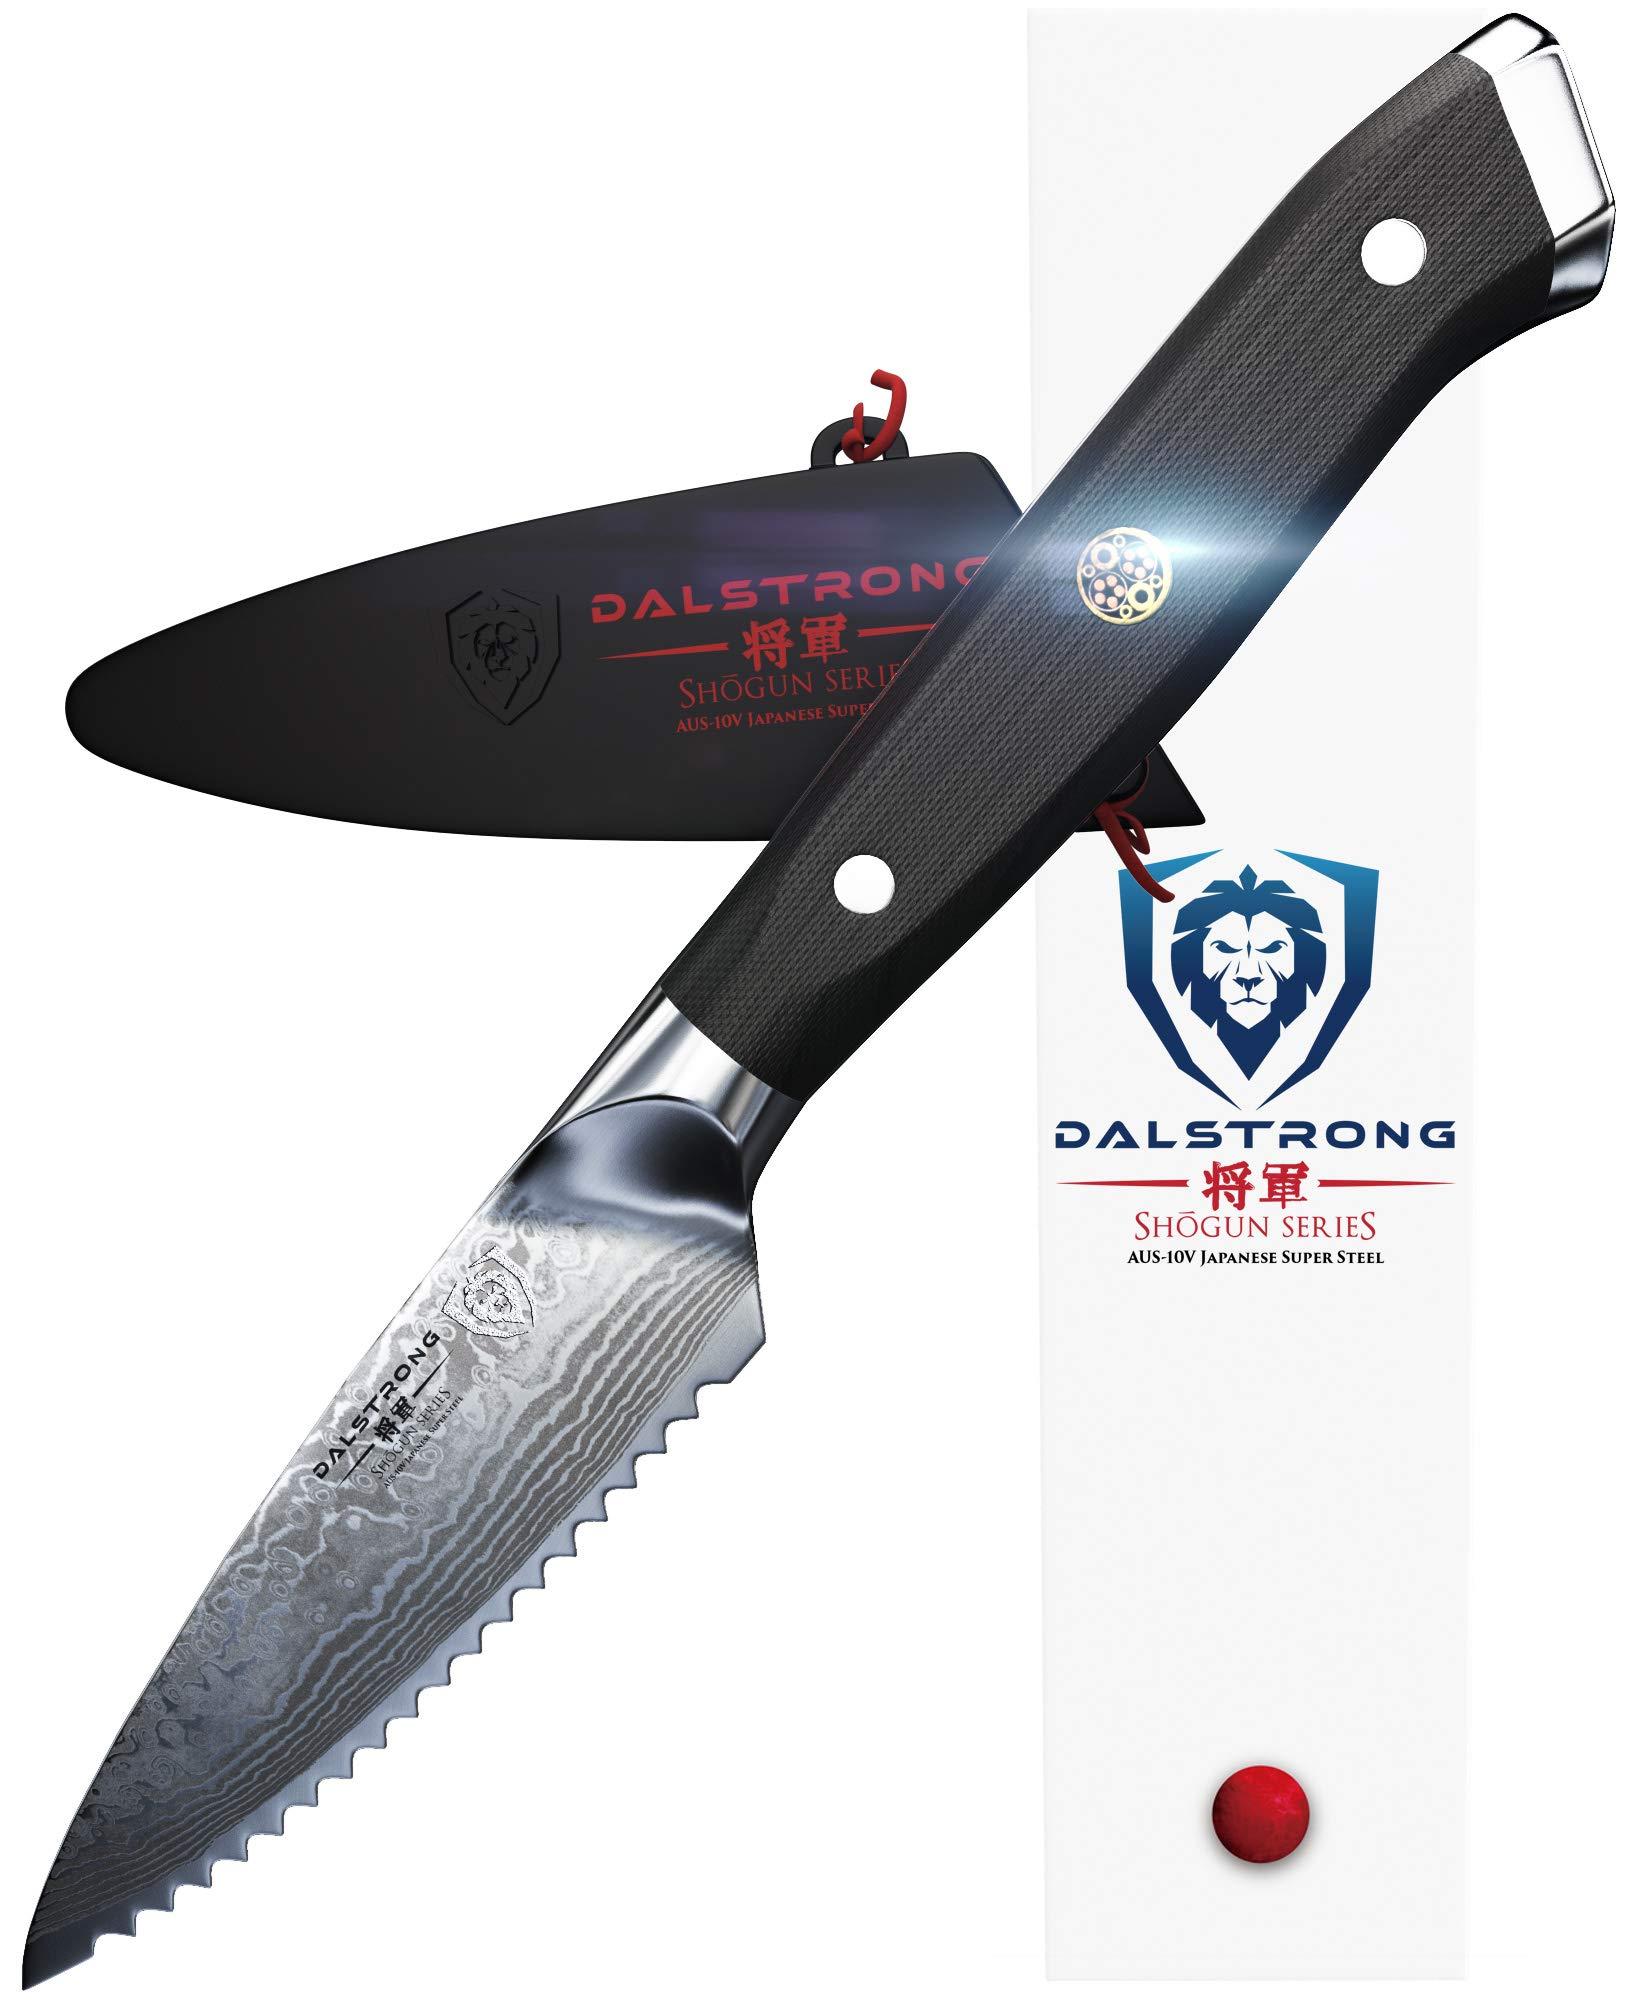 DALSTRONG Serrated Paring Knife - Shogun Series - VG10-3.5'' - Sheath